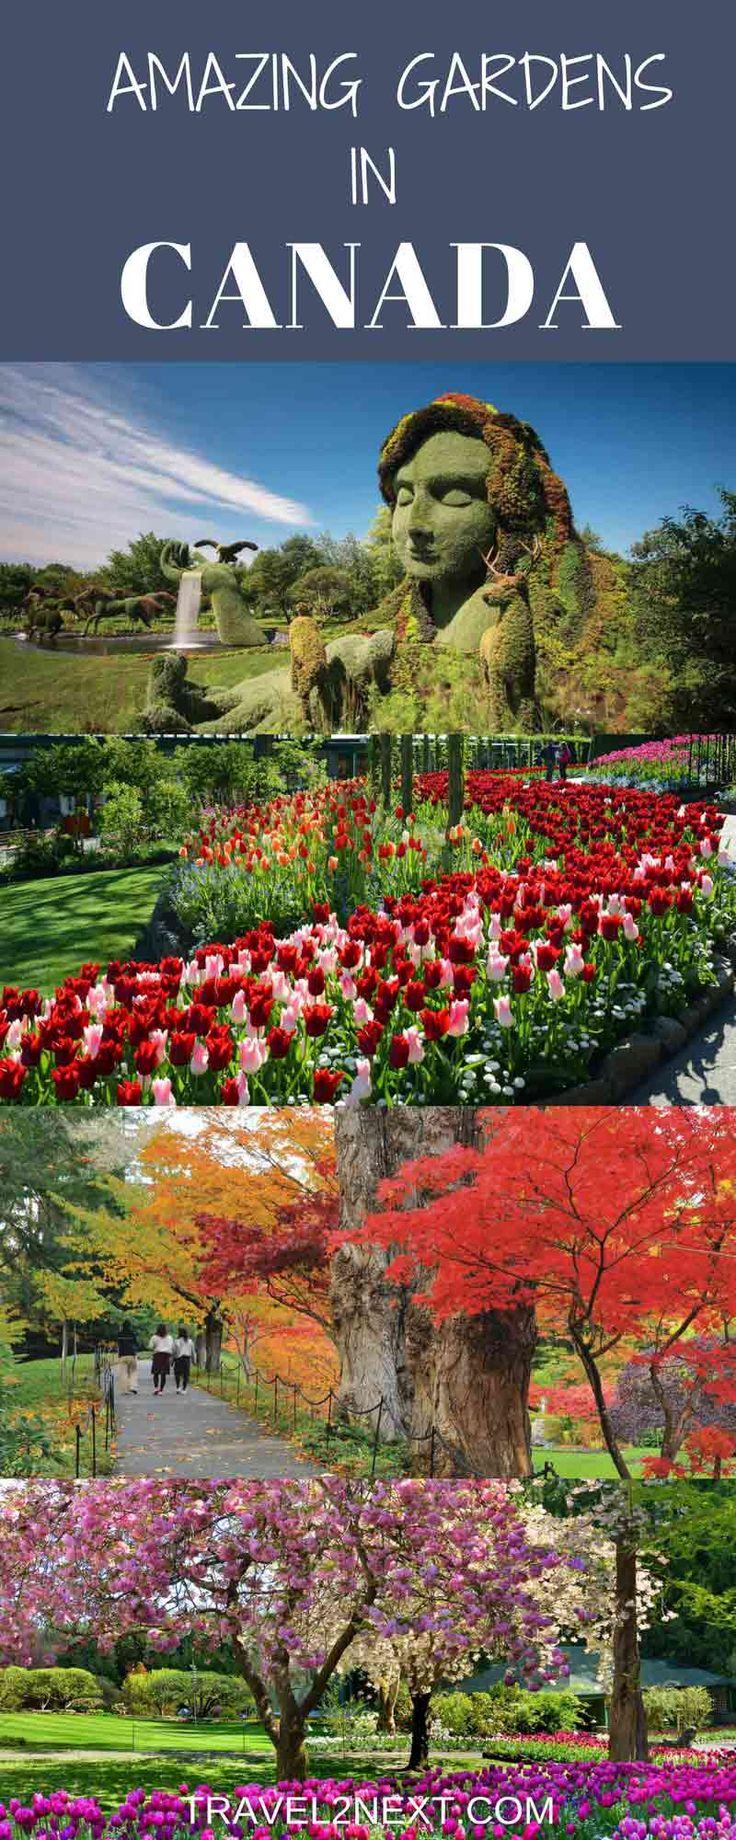 9 Amazing Canadian Gardens to Visit During Canada's 150th Celebrations https://travel2next.com/canadian-gardens-150th-celebrations/?utm_campaign=coschedule&utm_source=pinterest&utm_medium=Travel%202%20Next&utm_content=9%20Amazing%20Canadian%20Gardens%20to%20Visit%20During%20Canada%27s%20150th%20Celebrations